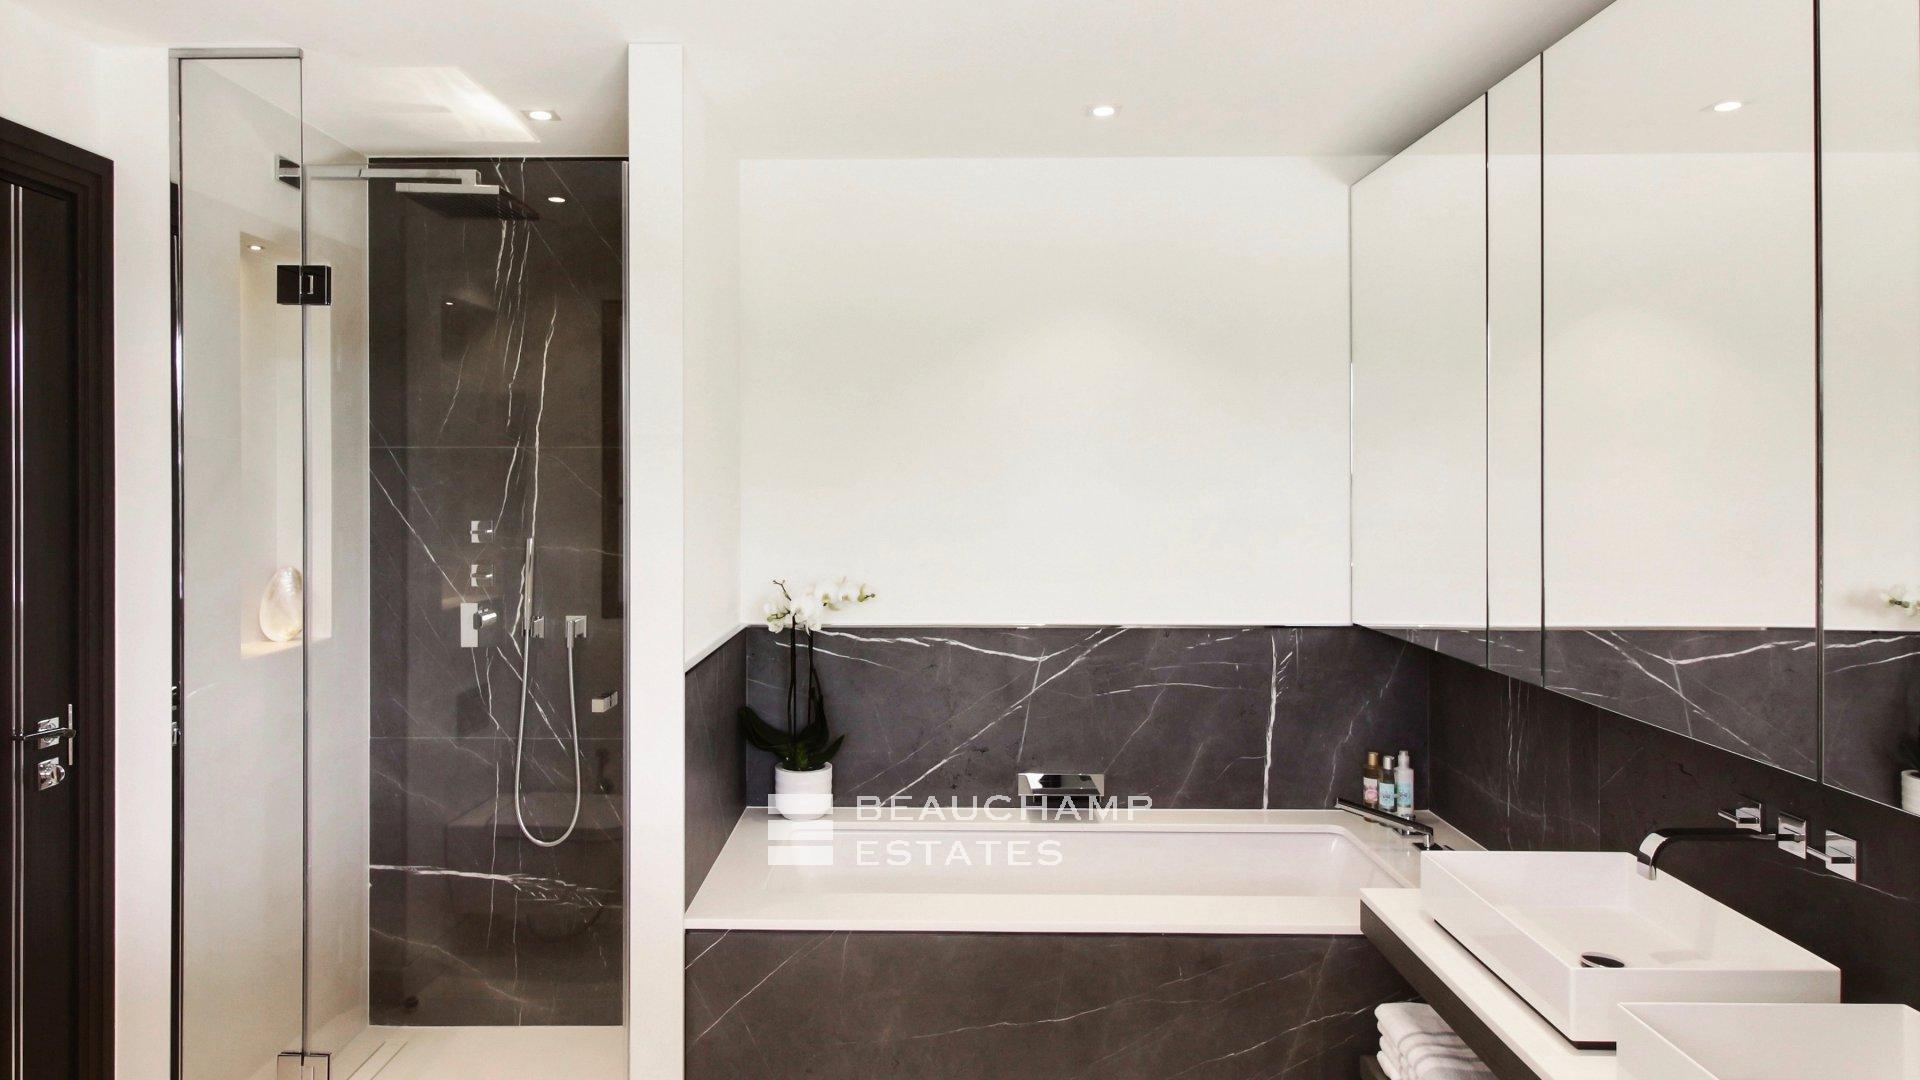 Splendid Renovated 5 bedroom Mas in Saint Paul de Vence